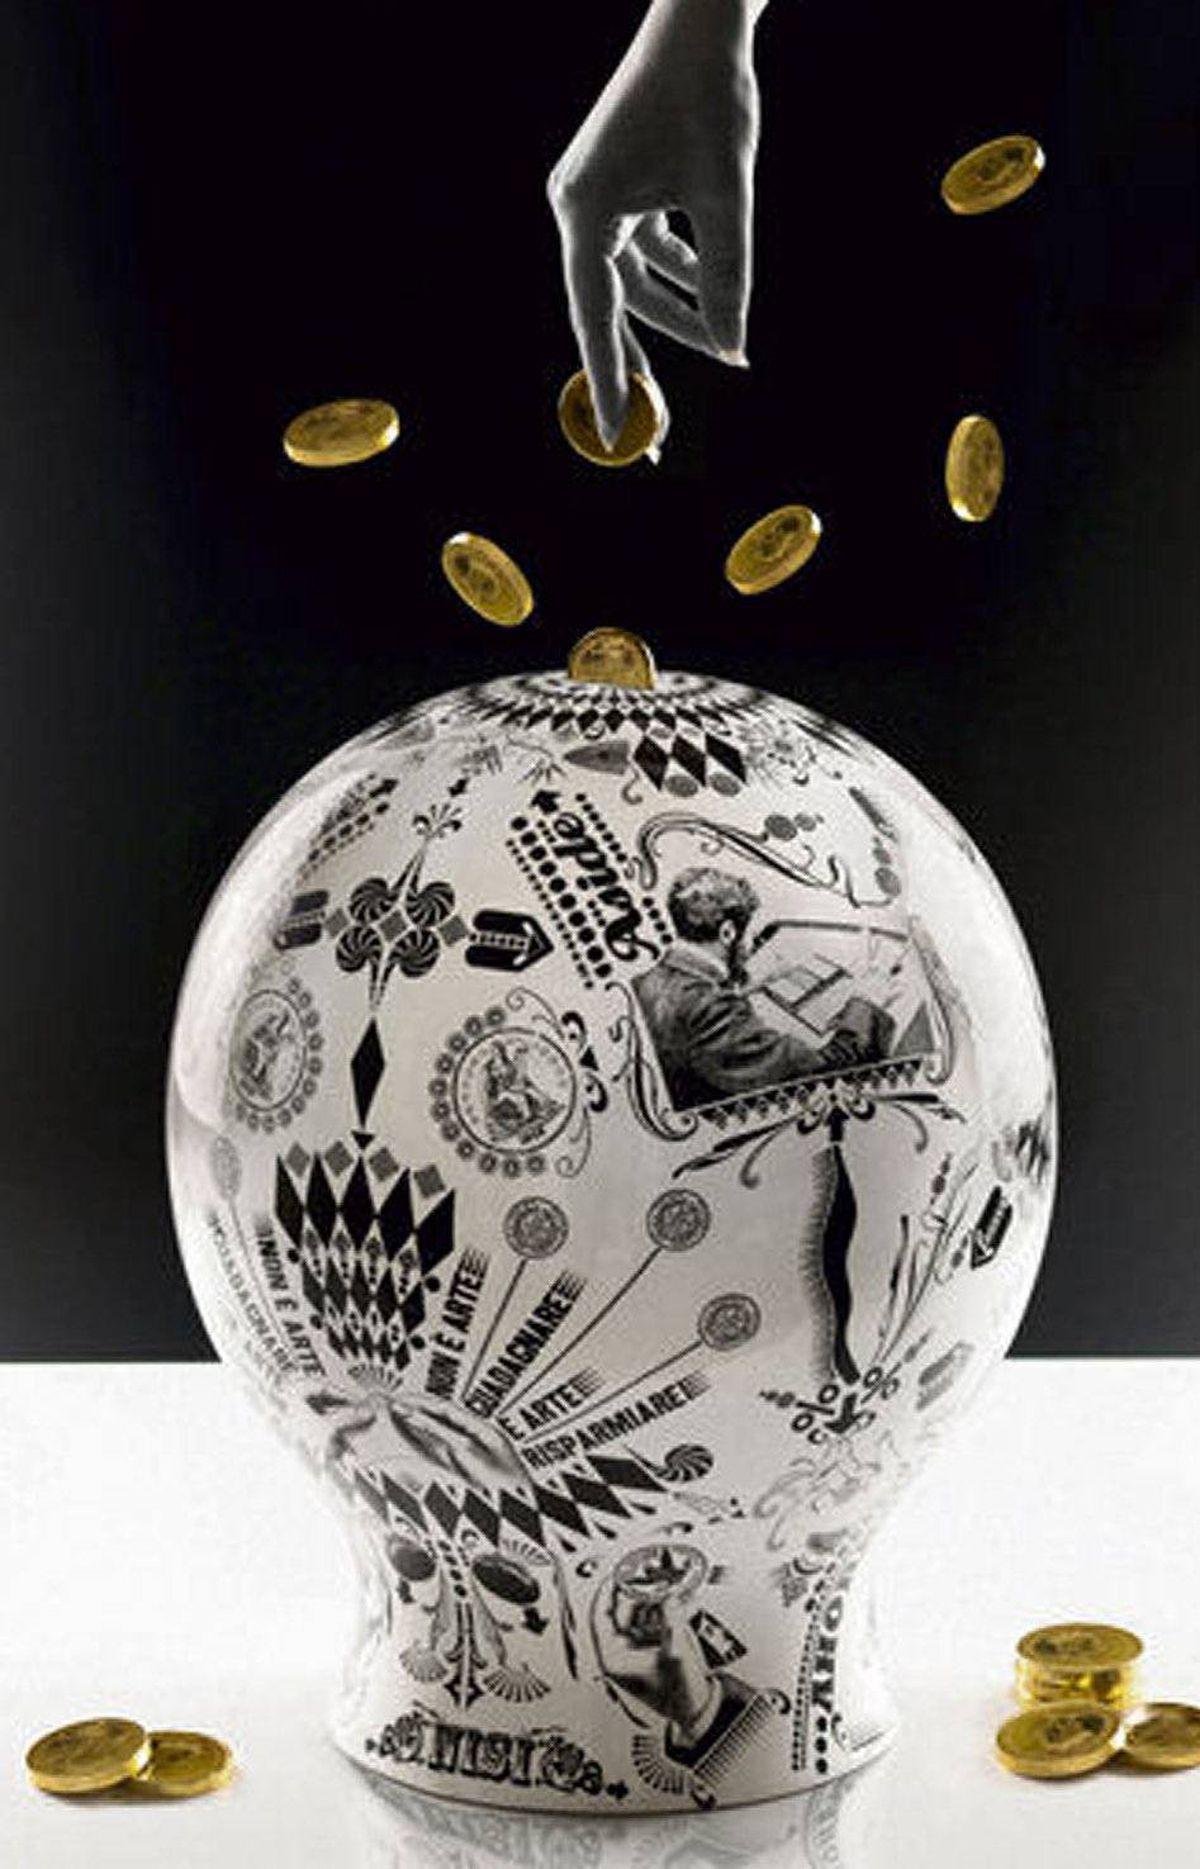 The Money Box by Lorenzo Petrantoni for Seletti.